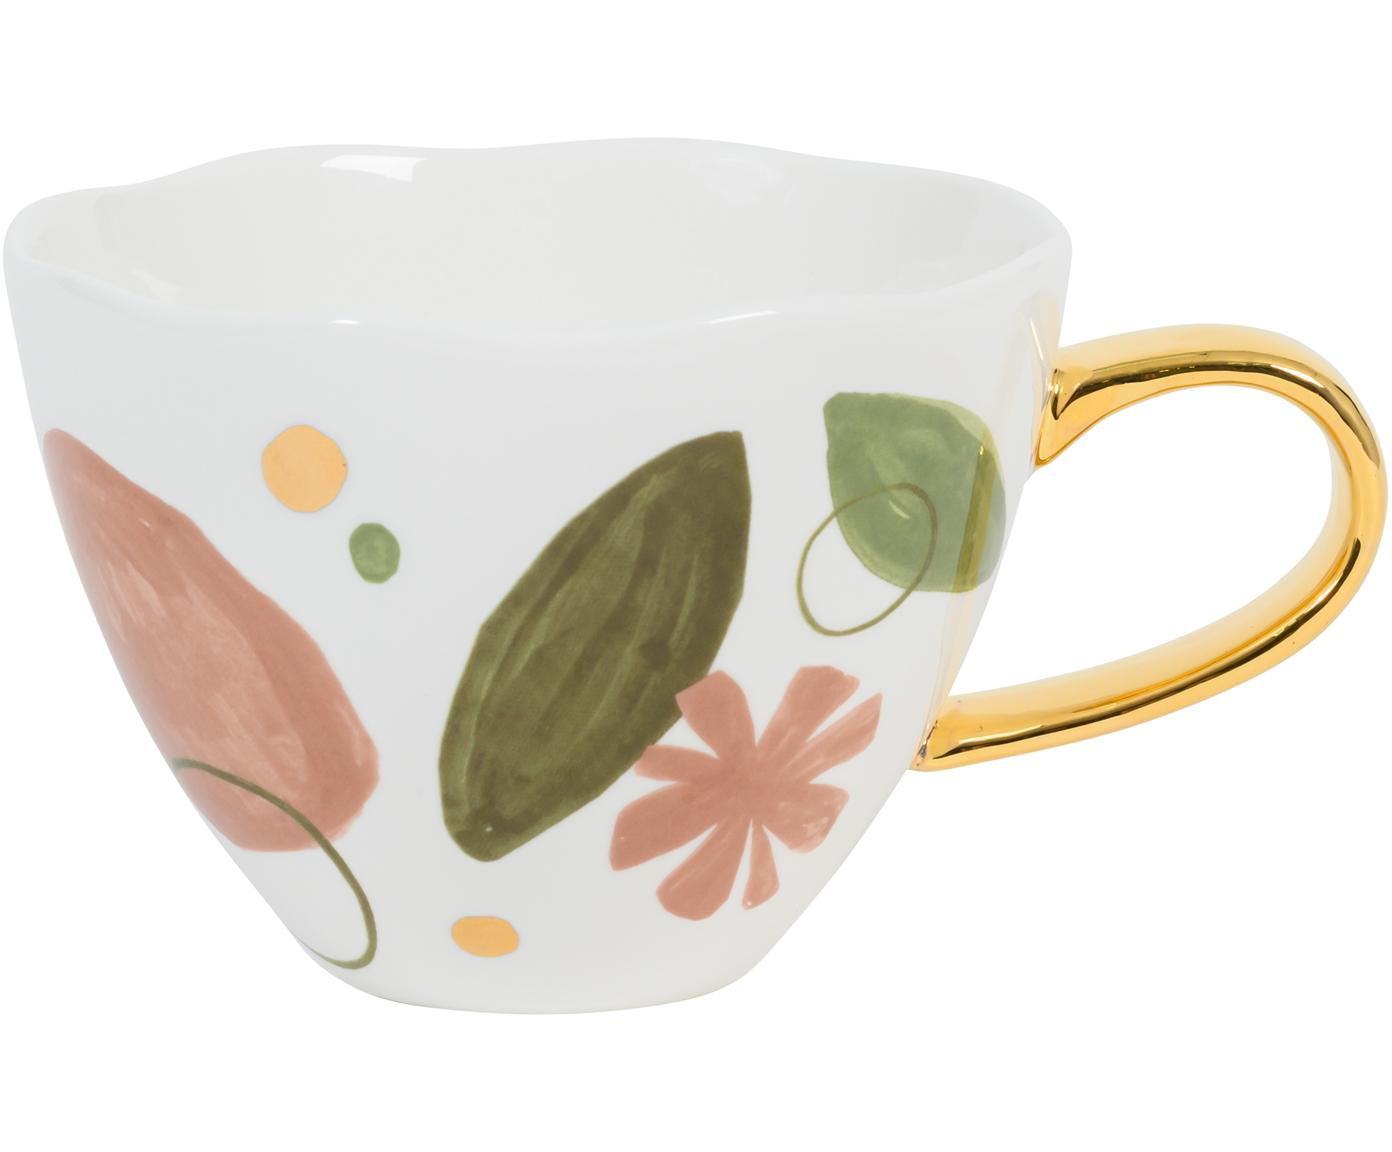 Tasse Expressive mit goldenem Griff, New Bone China, Weiß, Rosa, Grün, Goldfarben, Ø 11 x H 9 cm